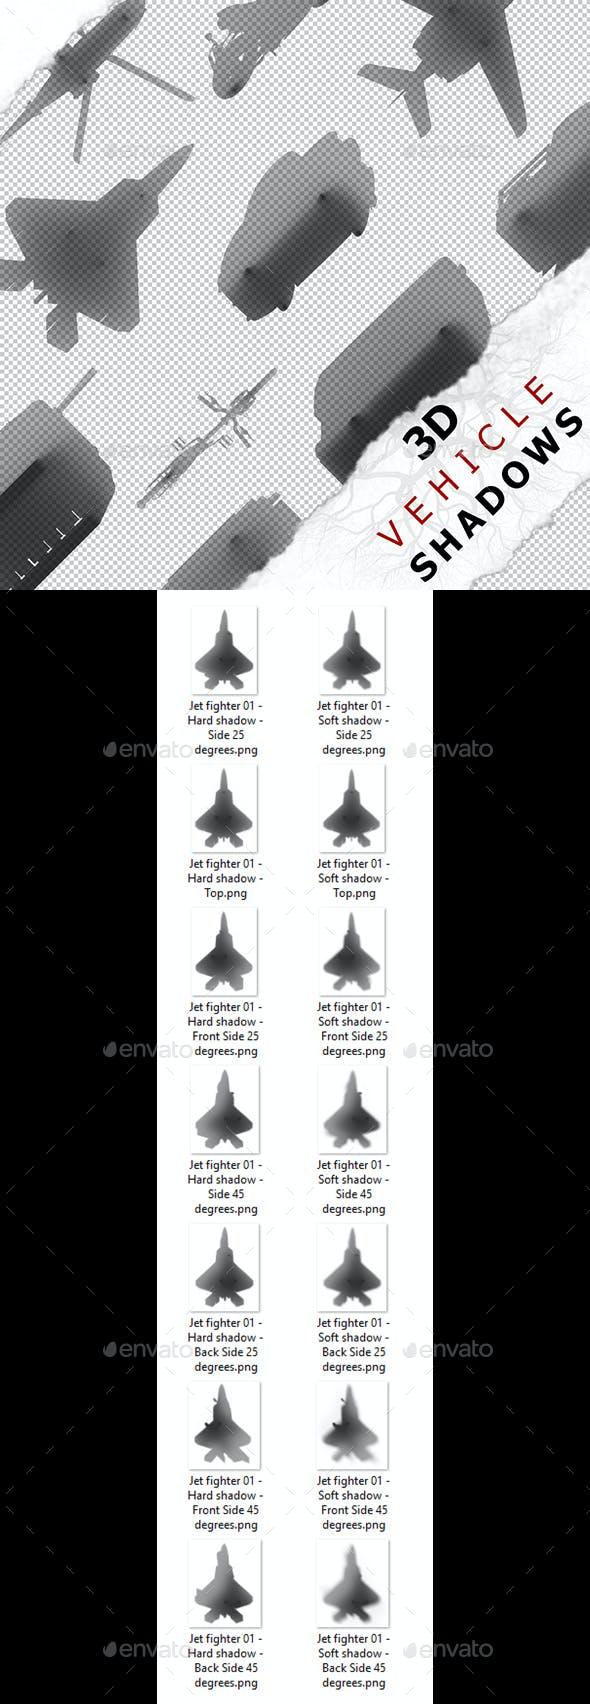 3D Shadow - Jet fighter 01 - 3DOcean Item for Sale